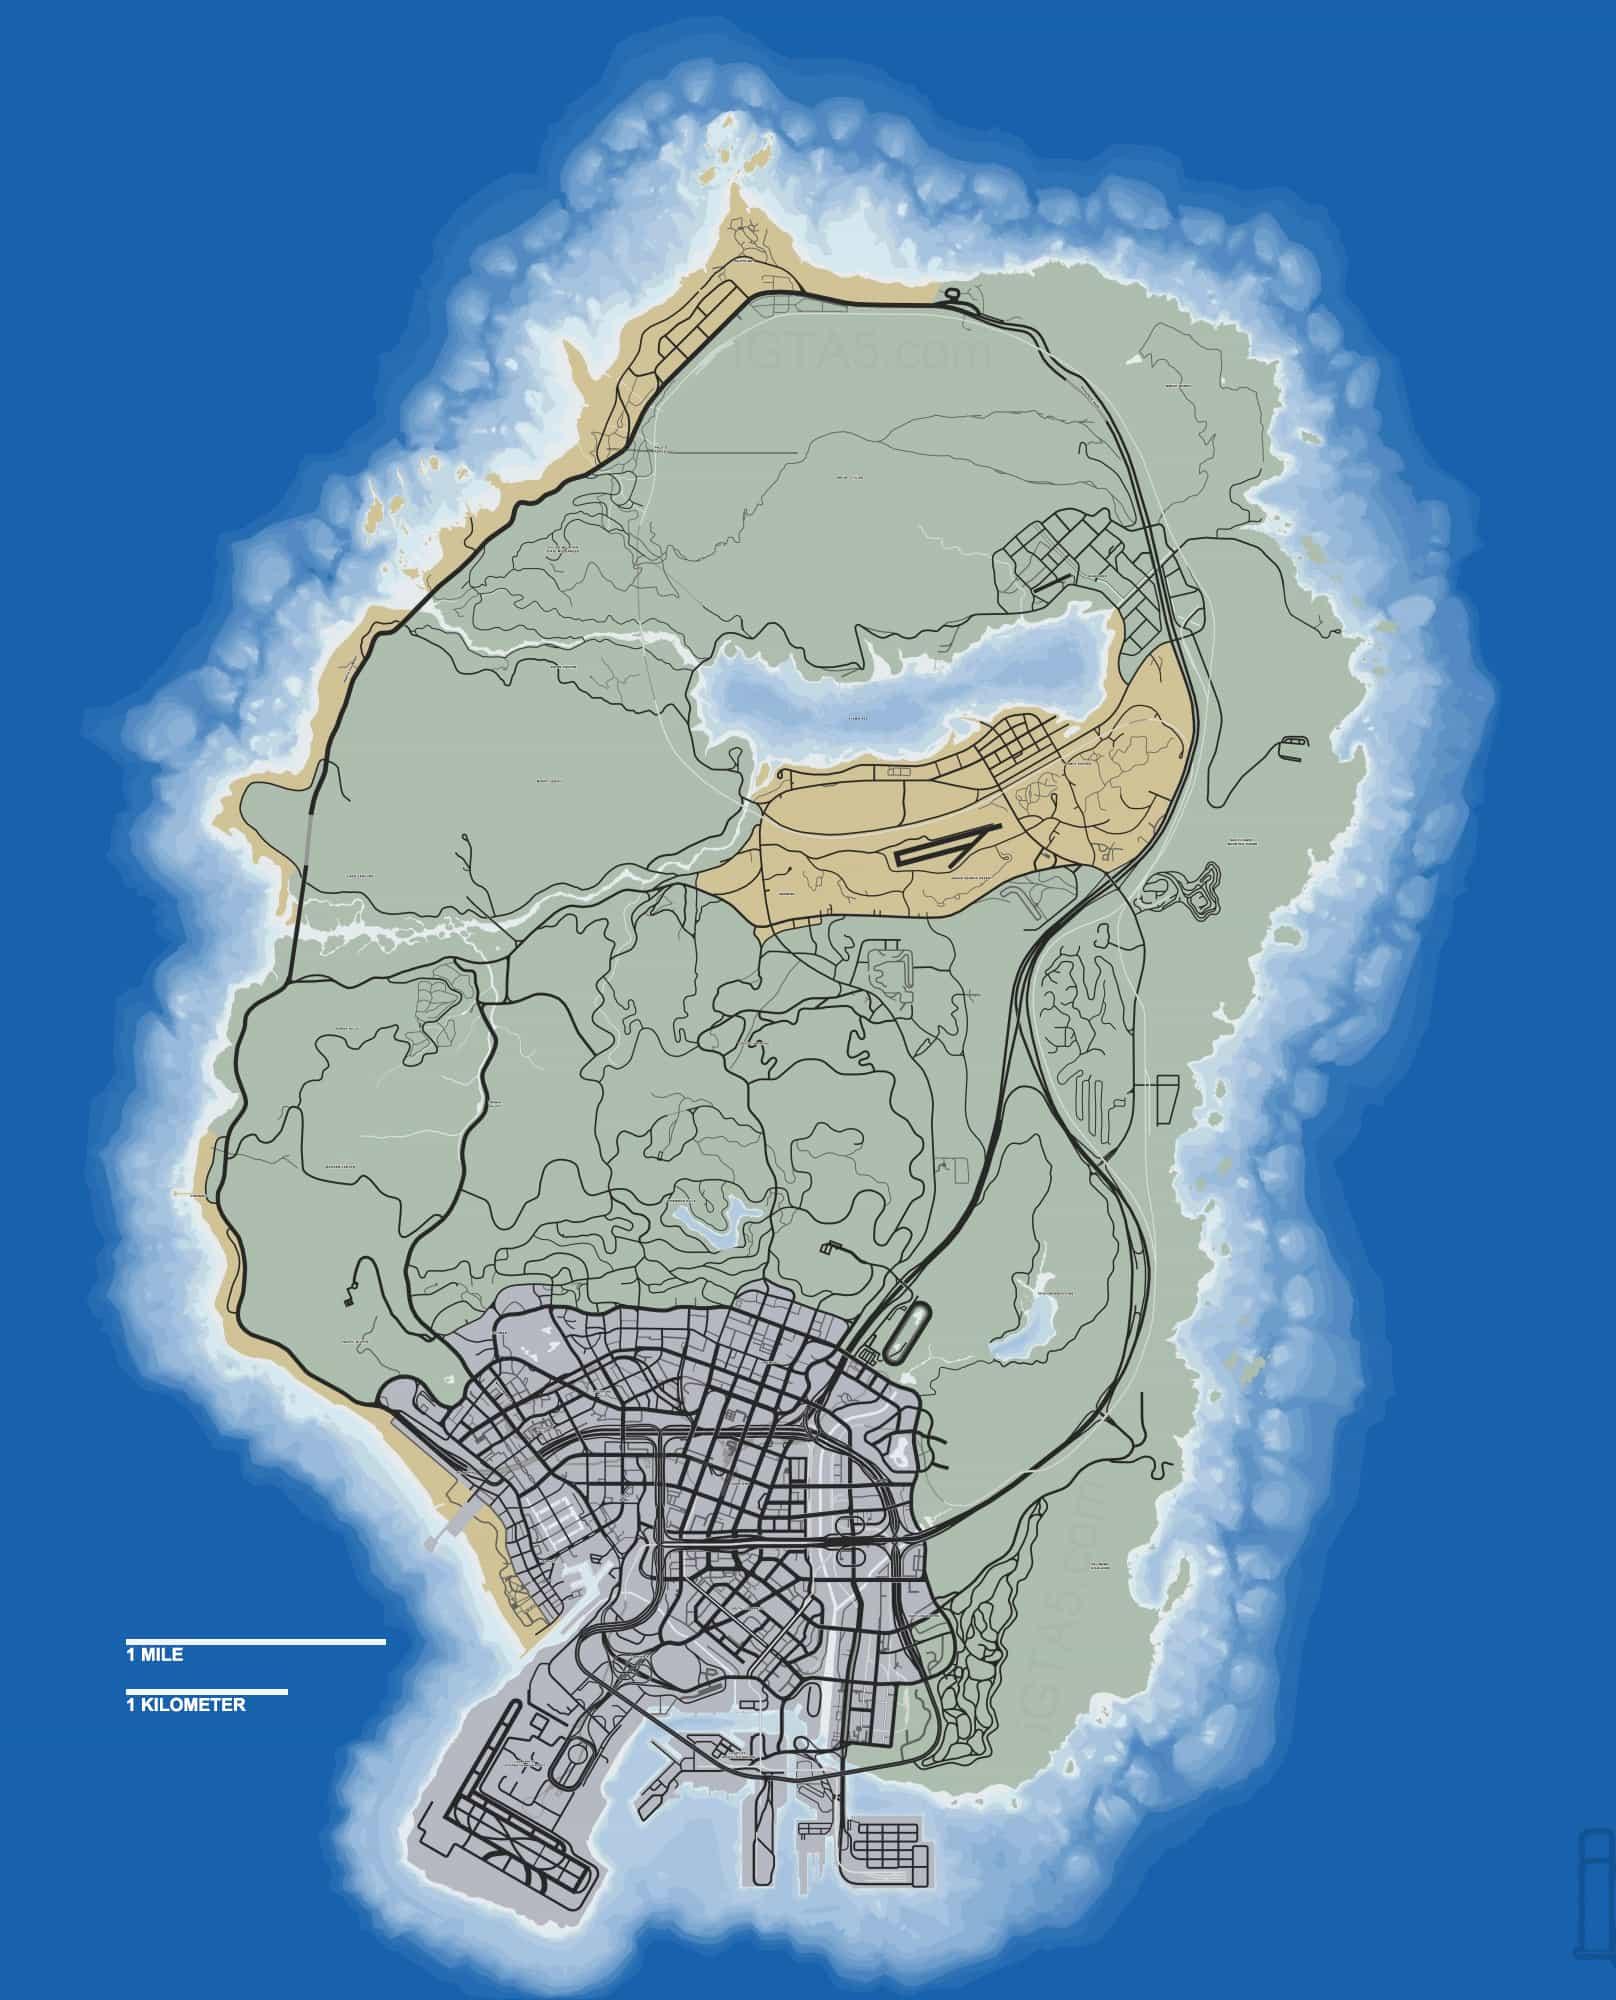 Fan Creates Gta V Map With The Correct Scale Gta Boom